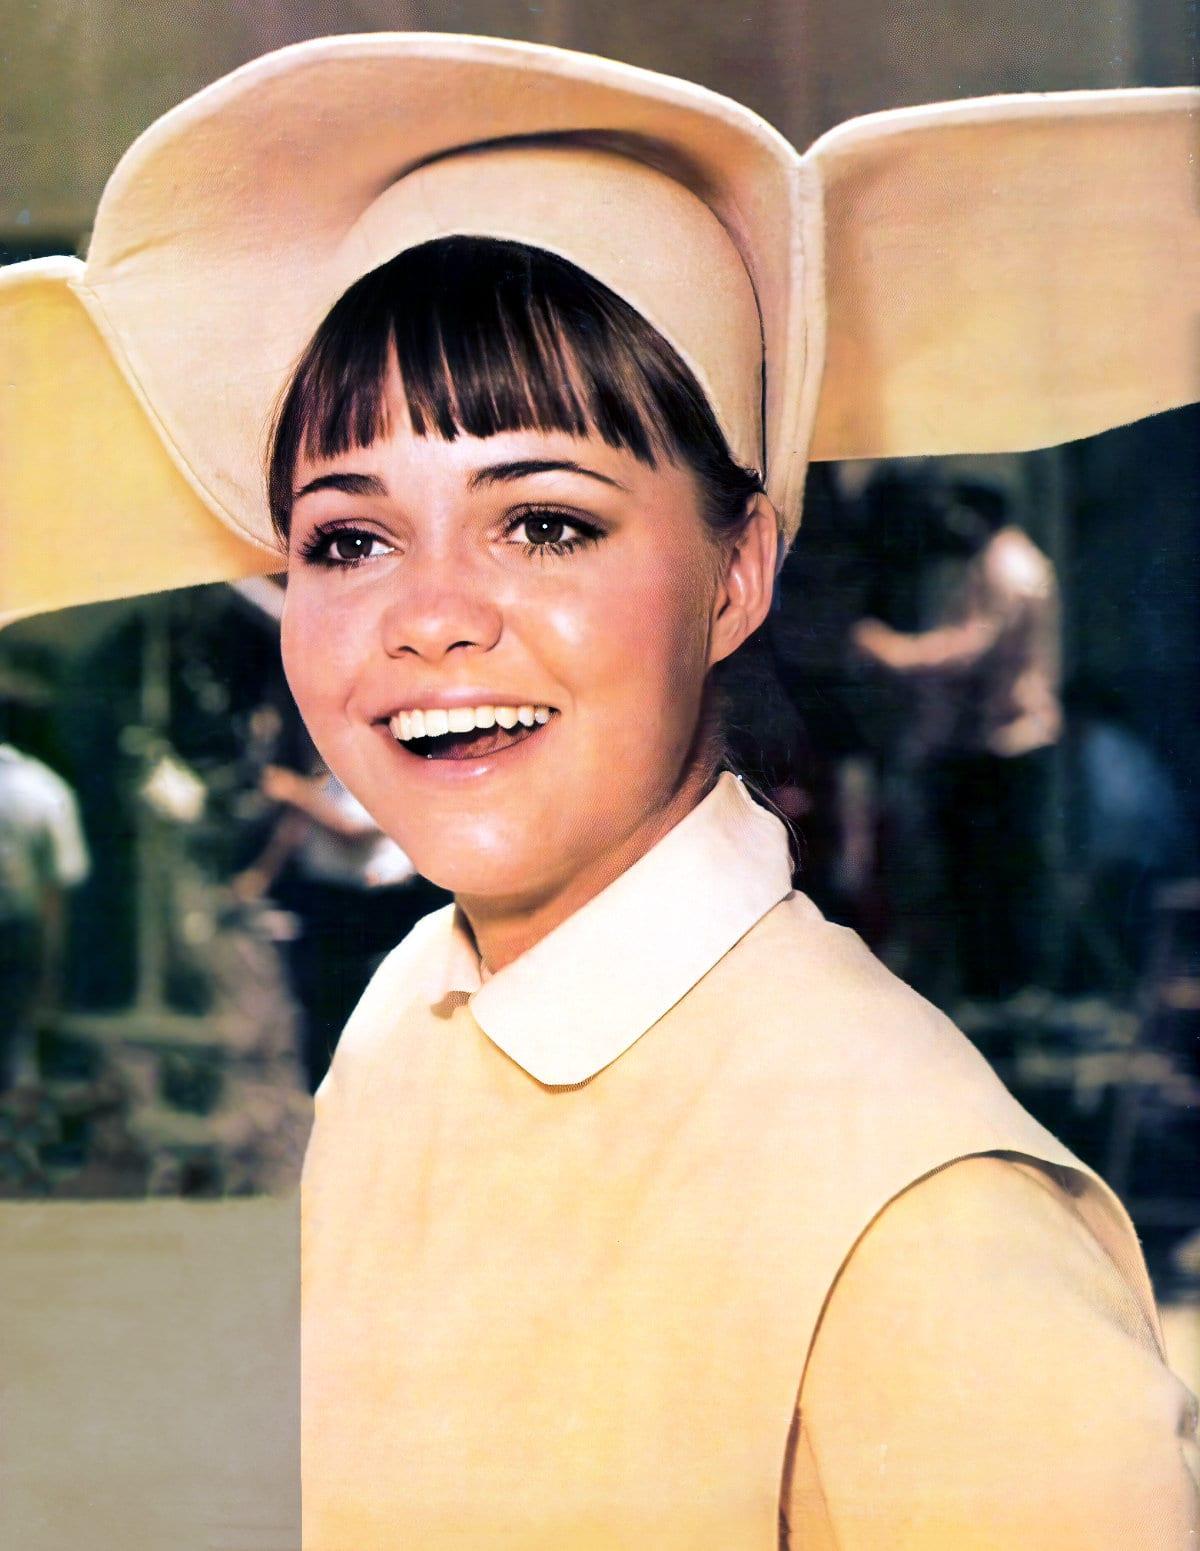 Vintage Sally Field in The Flying Nun